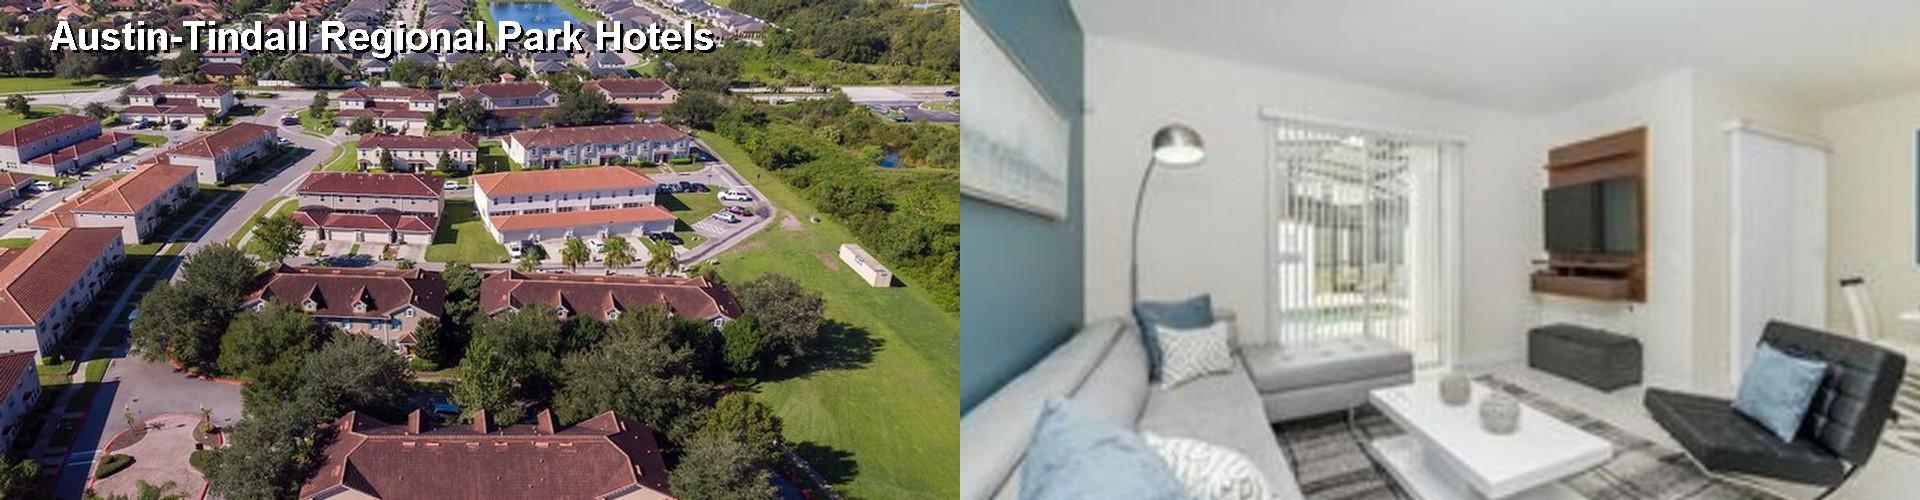 Hotels And Motels Near Disney World